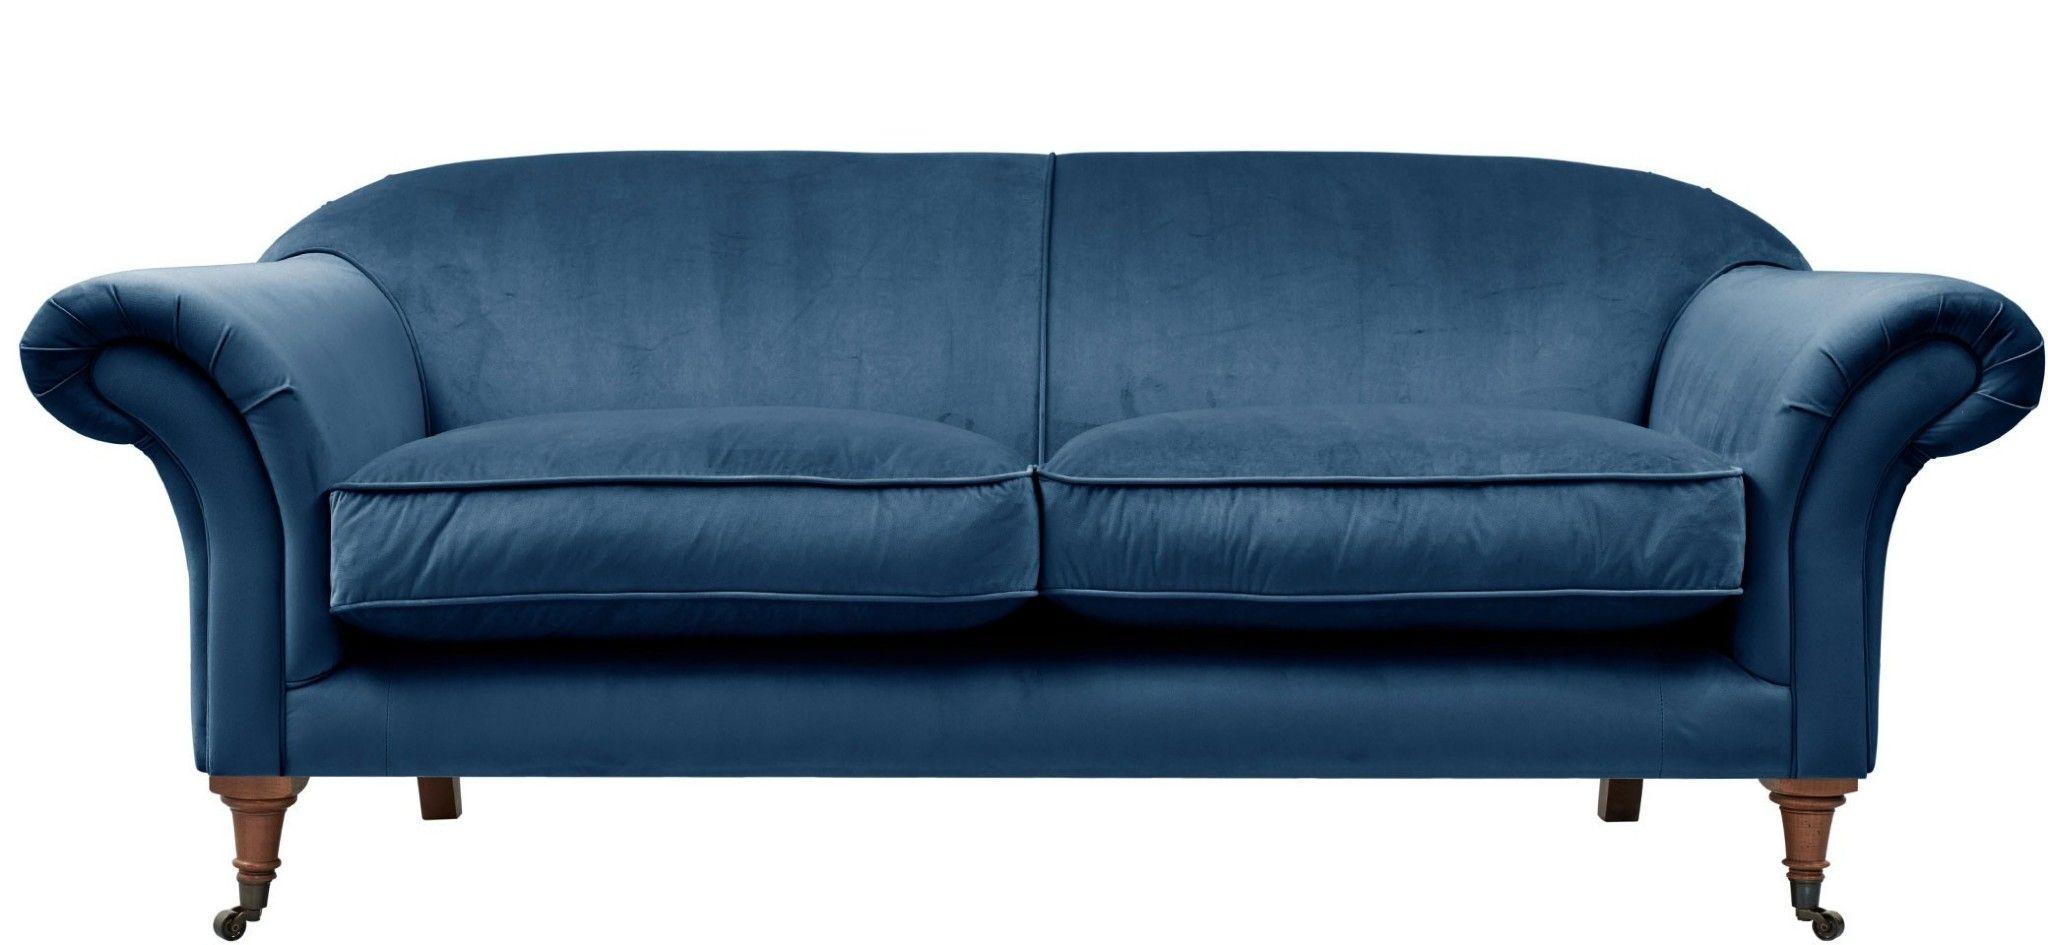 Pin By Sasha Roy On Living Room Cushions On Sofa Blue Sofa 3 Seater Sofa